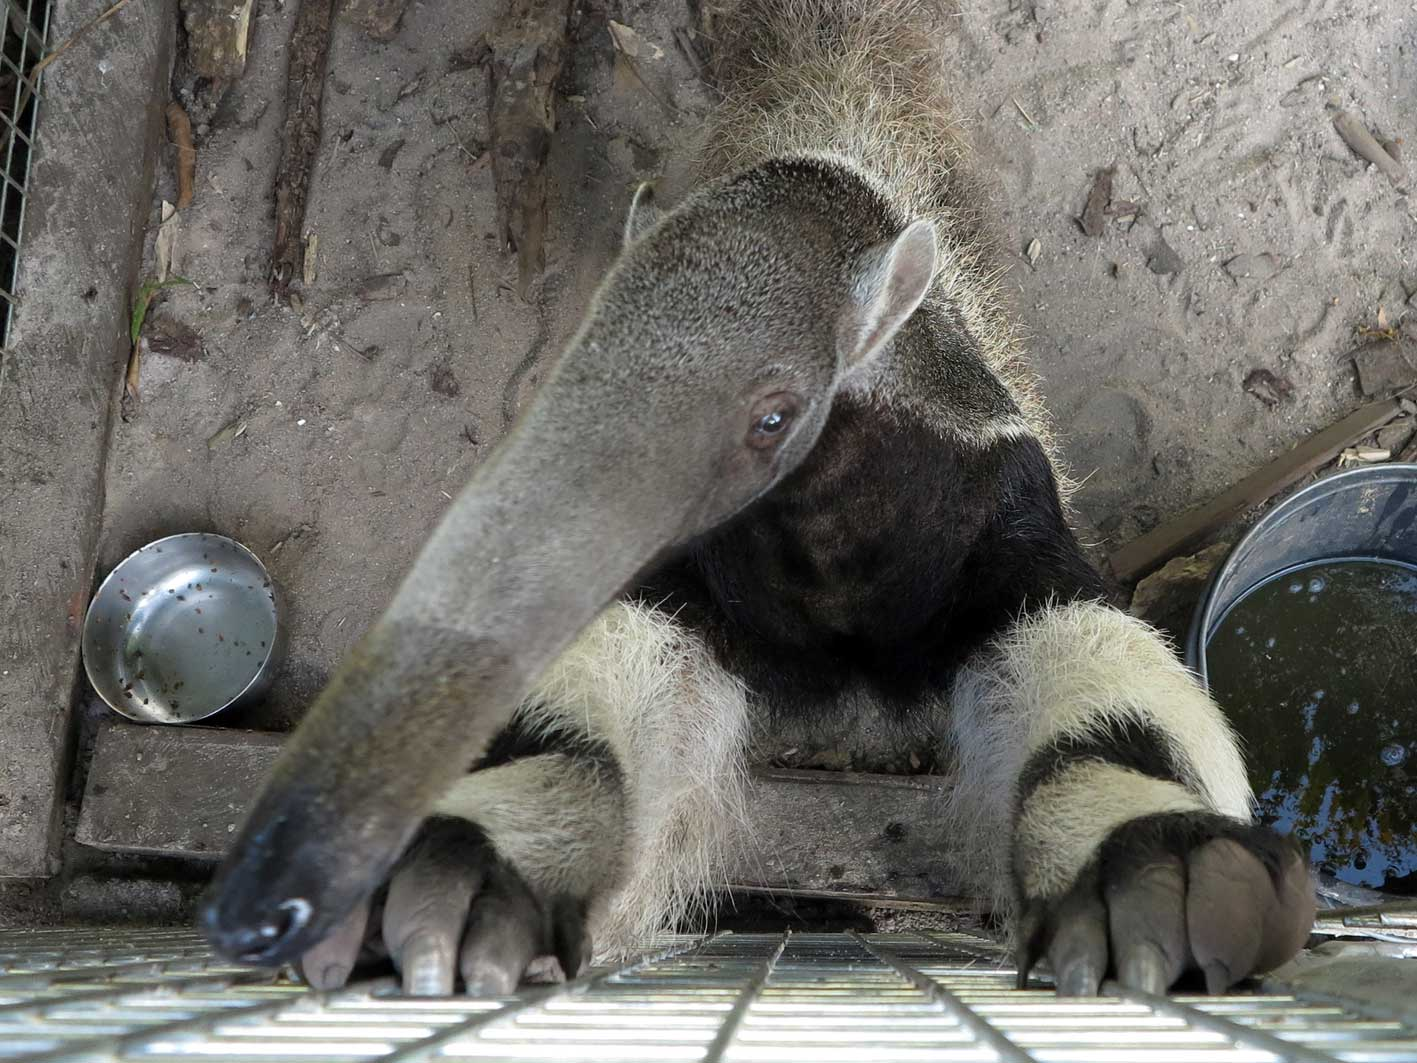 Giant anteater, 'Artie'